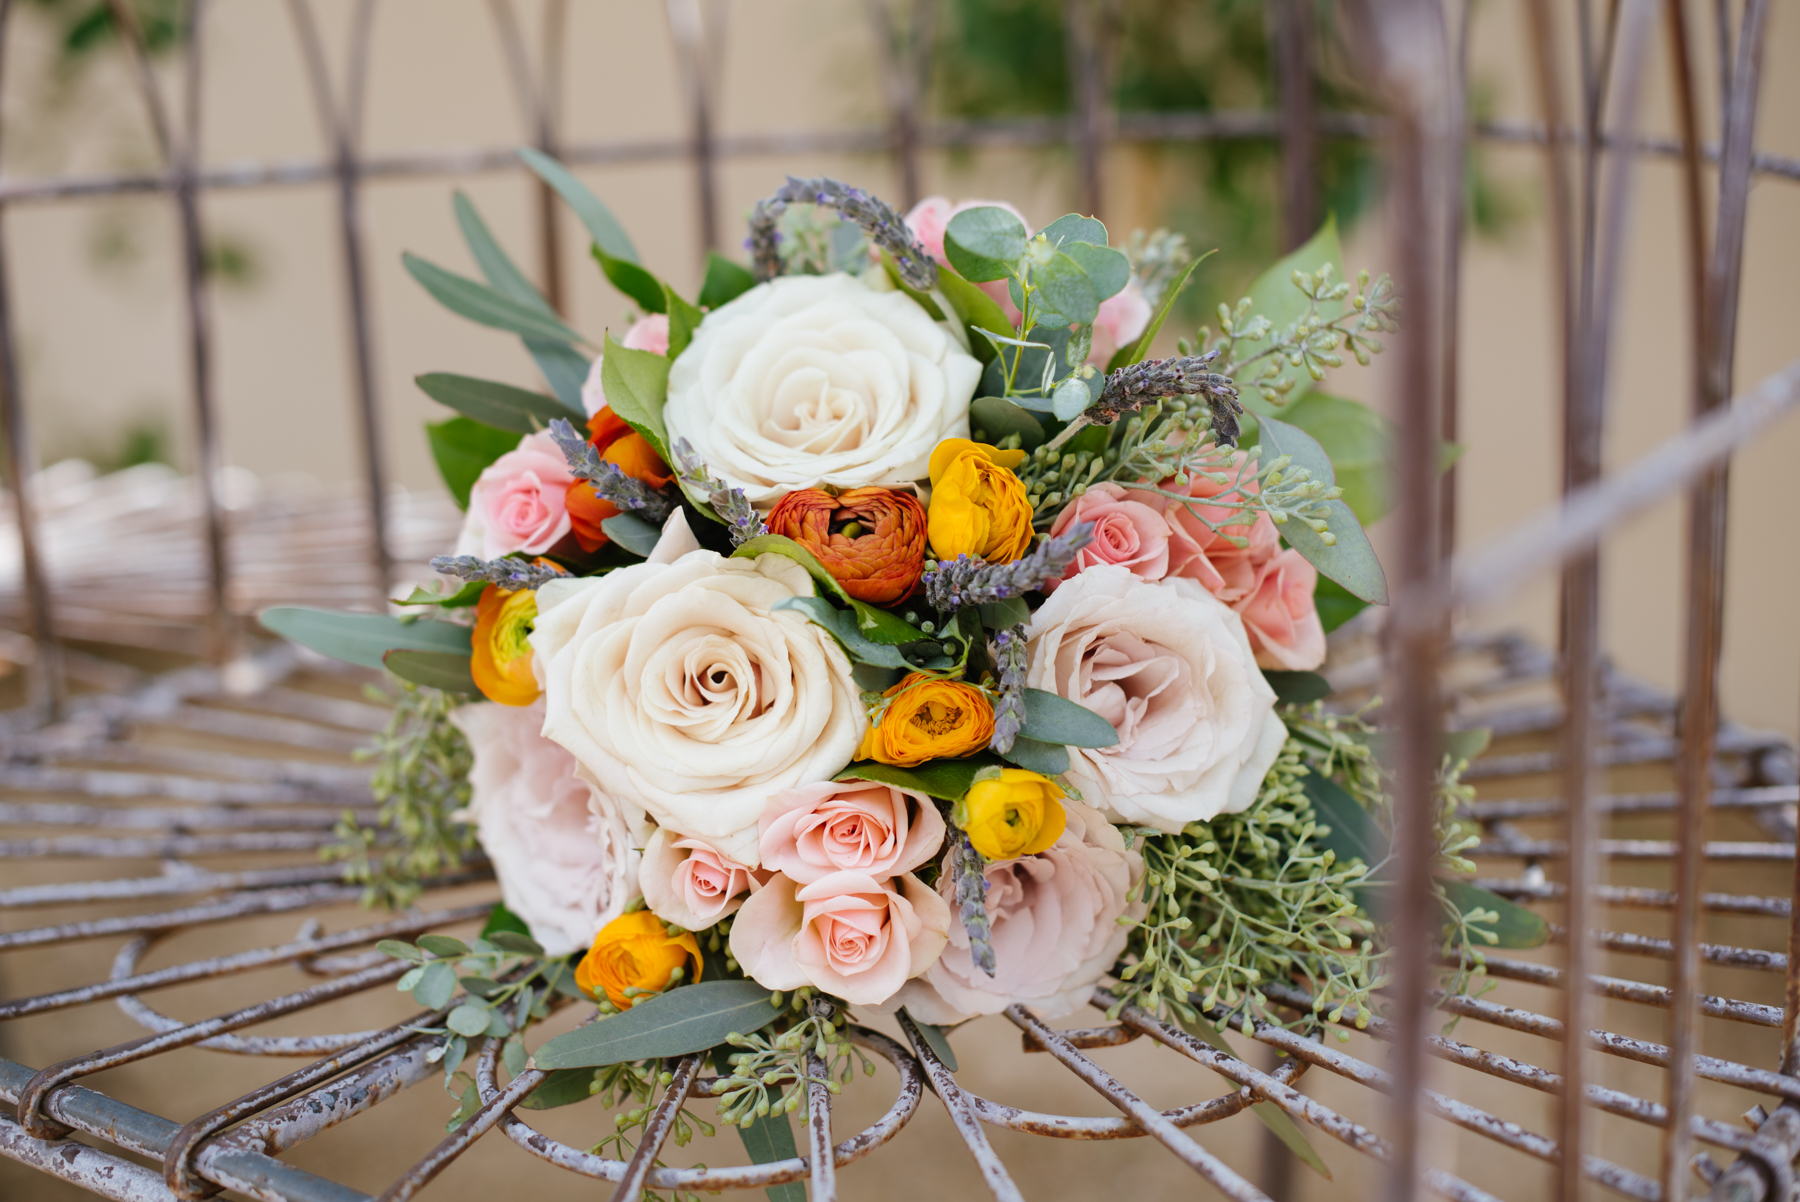 Secret Garden Event Center Wedding - Meredith Amadee Photography-48.jpg